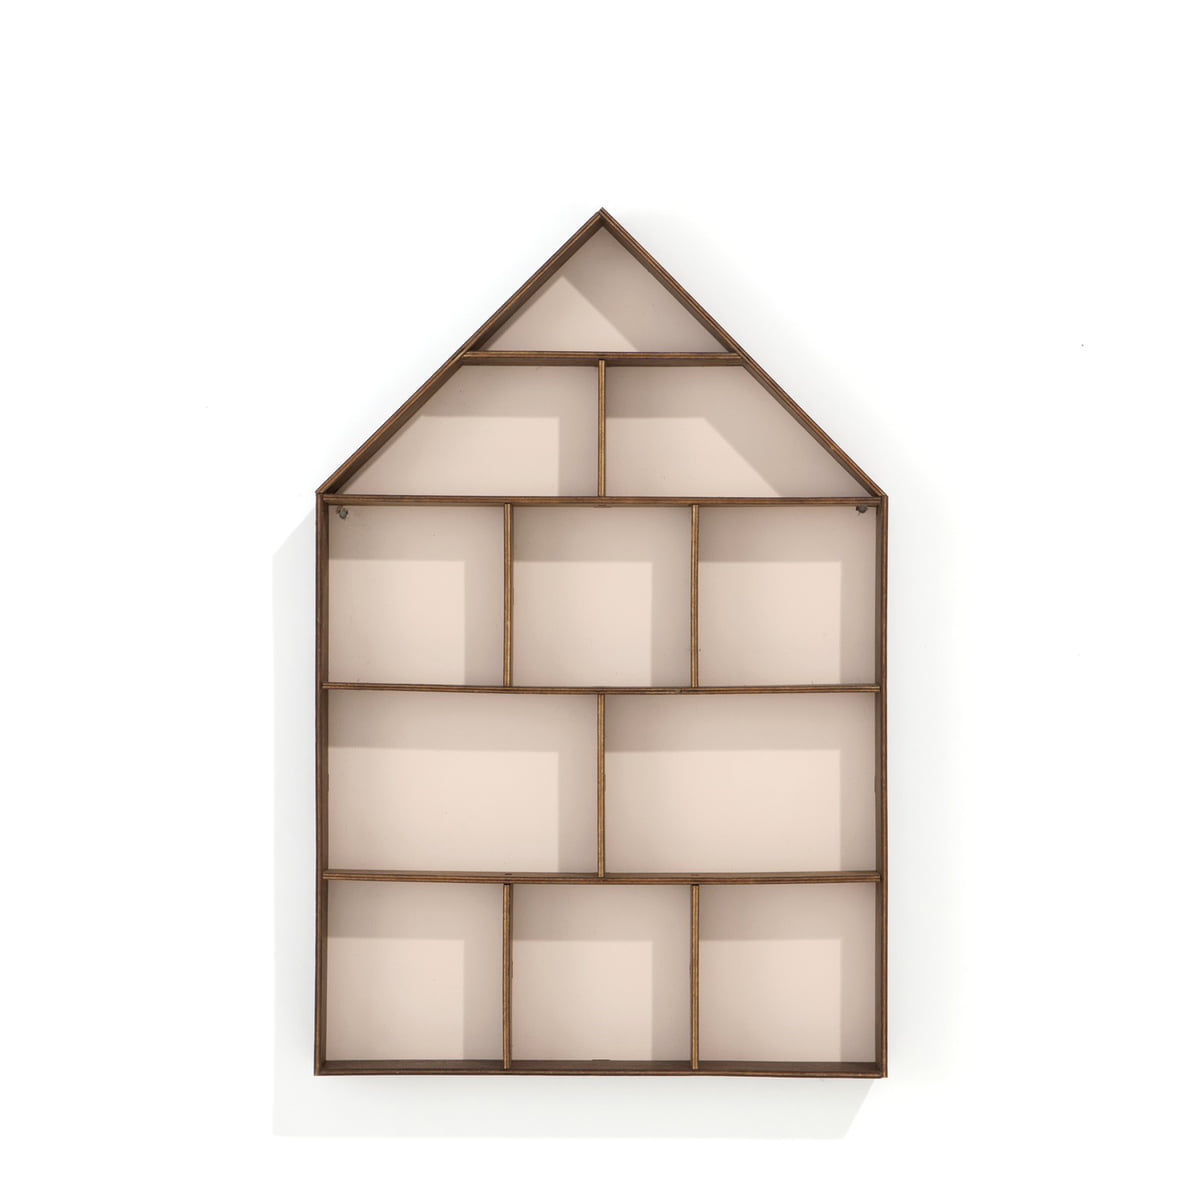 das the dorm regal von ferm living im shop. Black Bedroom Furniture Sets. Home Design Ideas